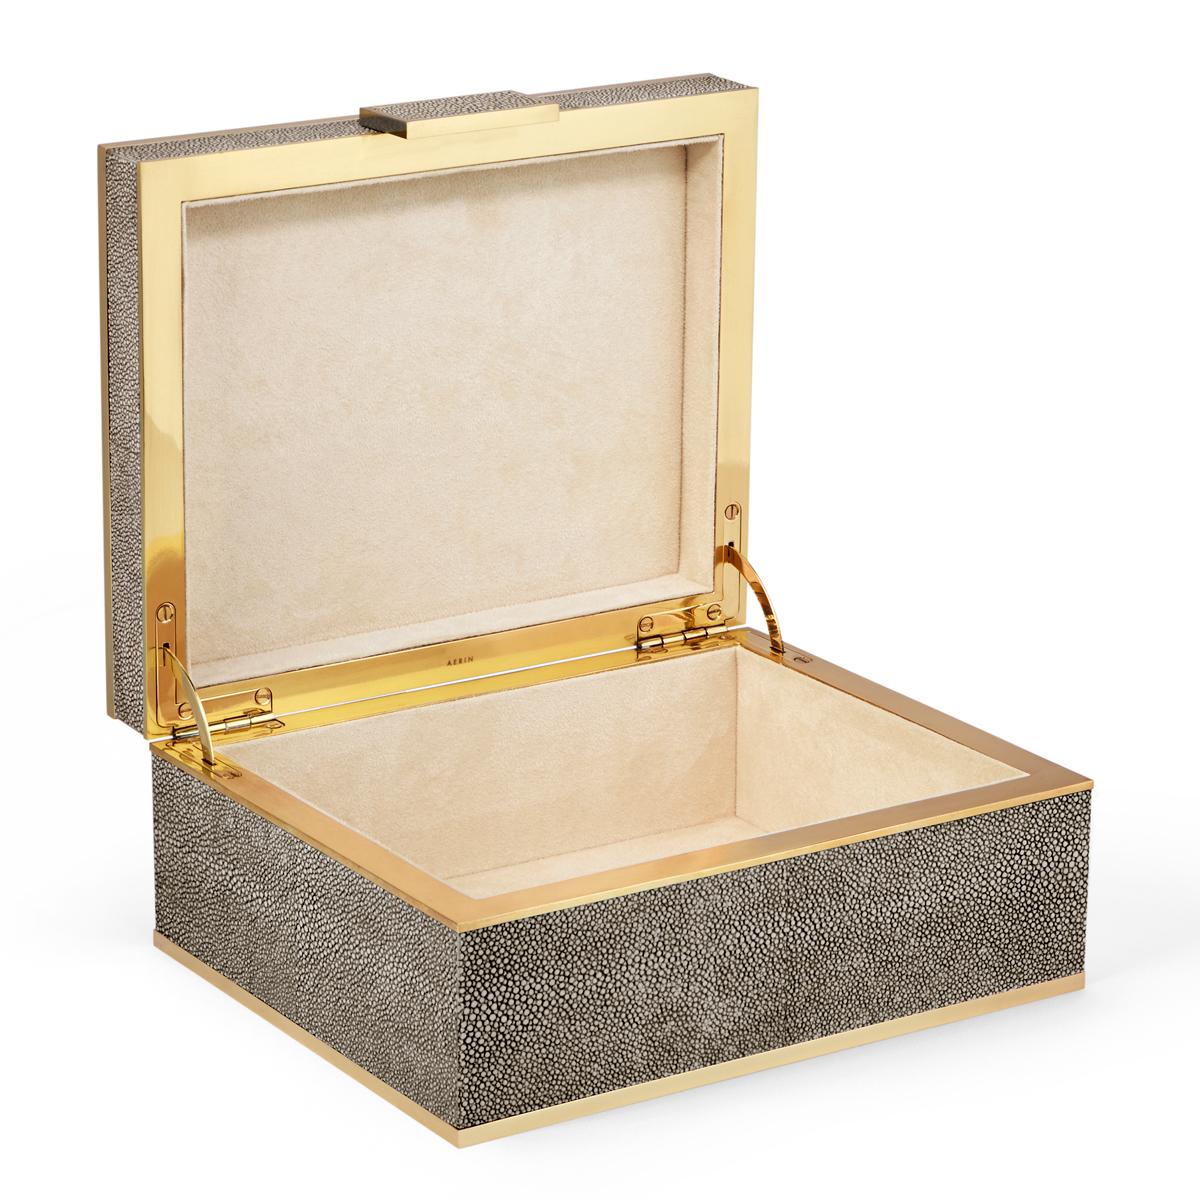 Aerin Classic Shagreen Small Jewelry Box, Chocolate